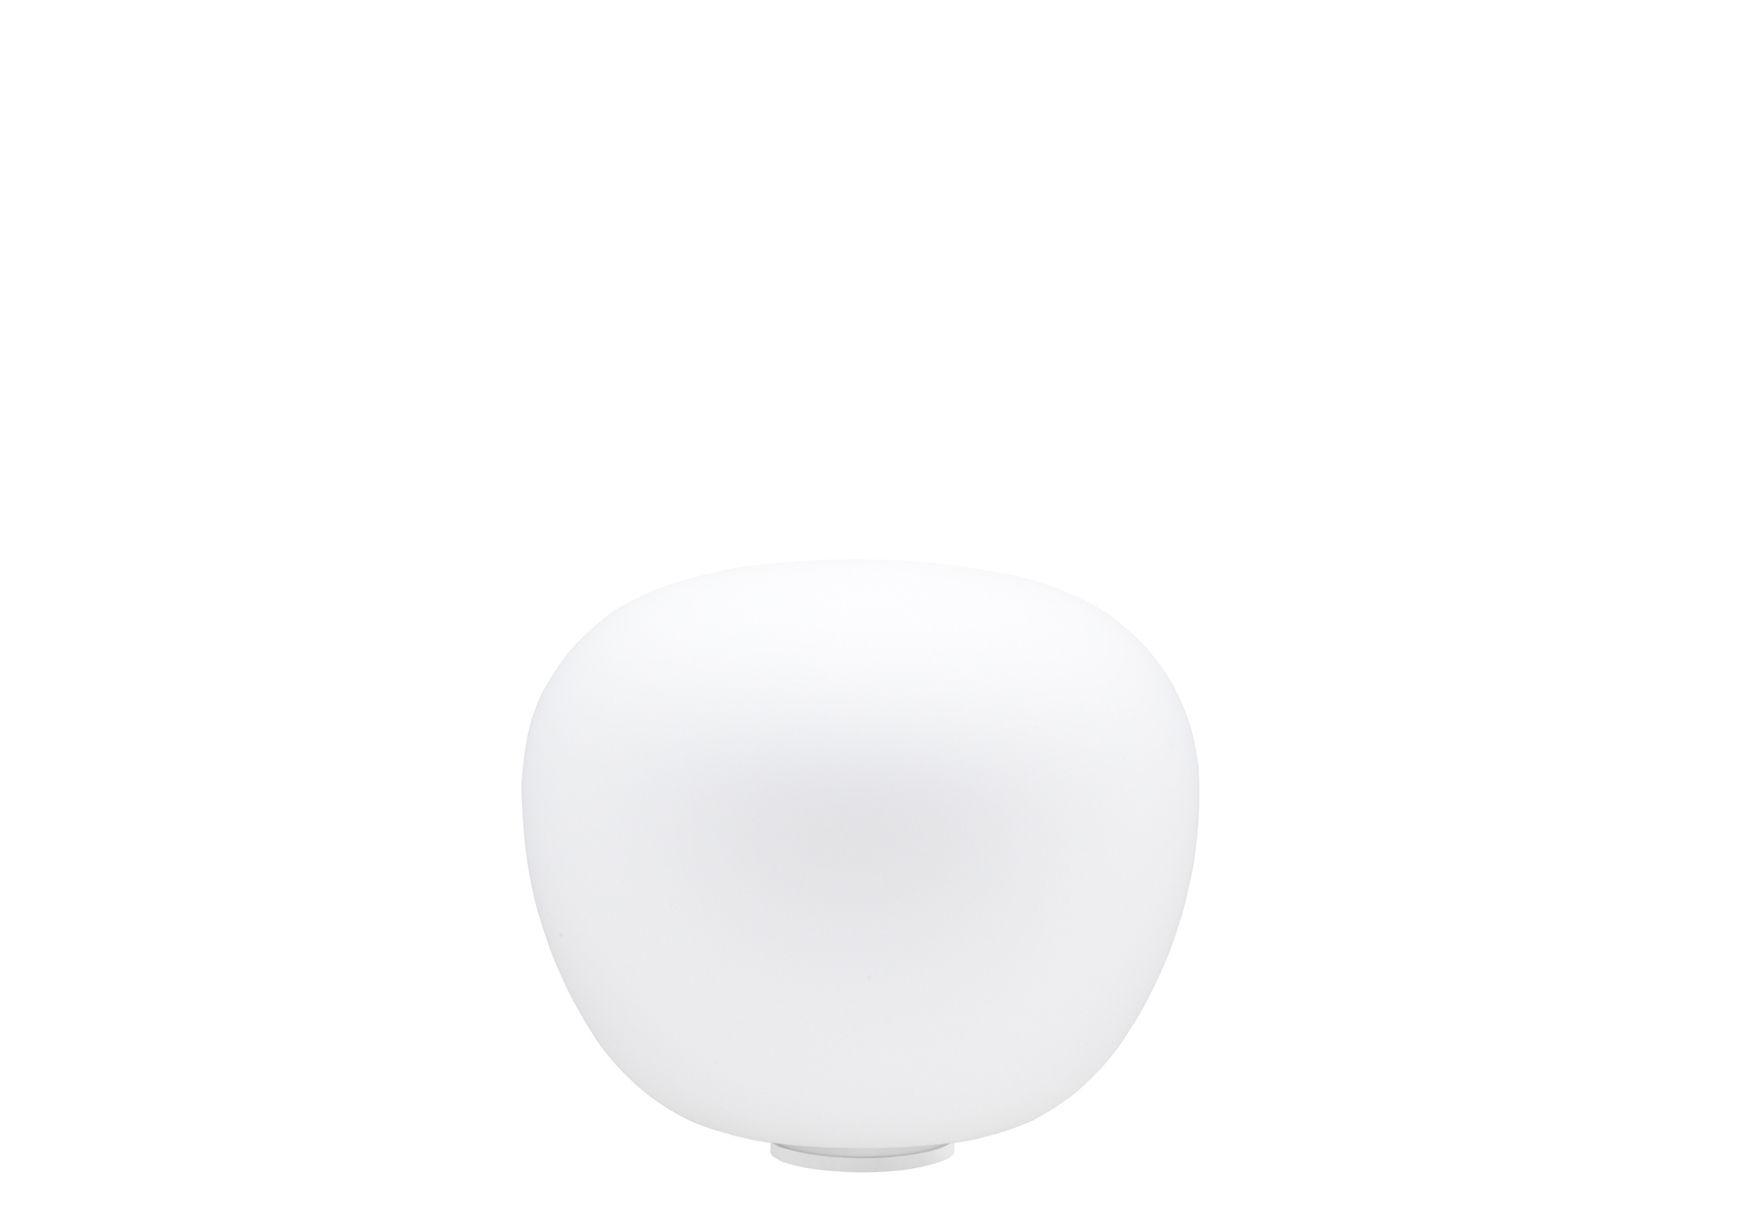 Lighting - Table Lamps - Mochi Table lamp - Ø 12 cm by Fabbian - White - Ø 12 cm - Glass